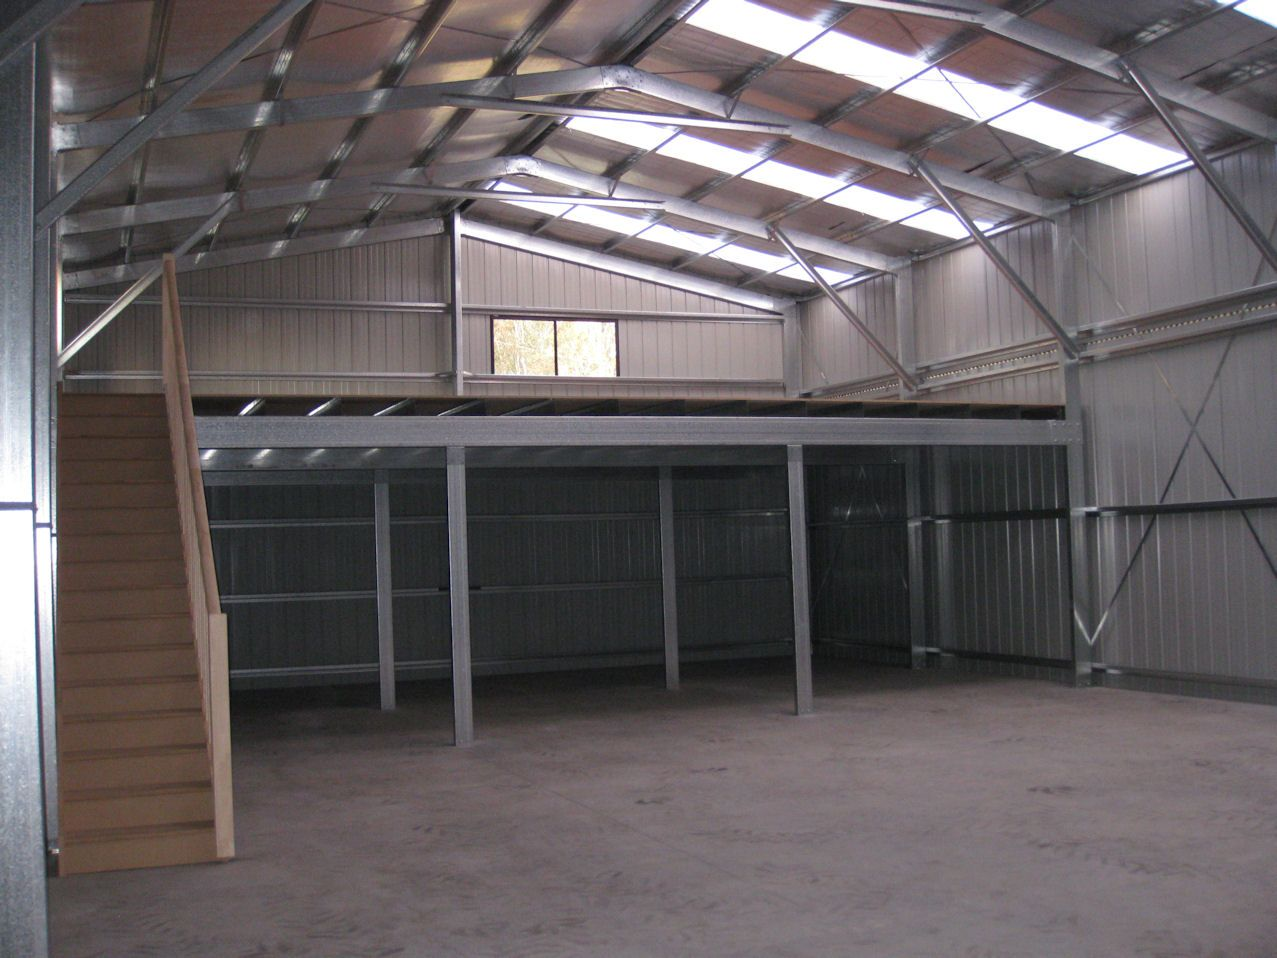 Shed Homes LOFT Farm shed, Shed homes, Metal building homes